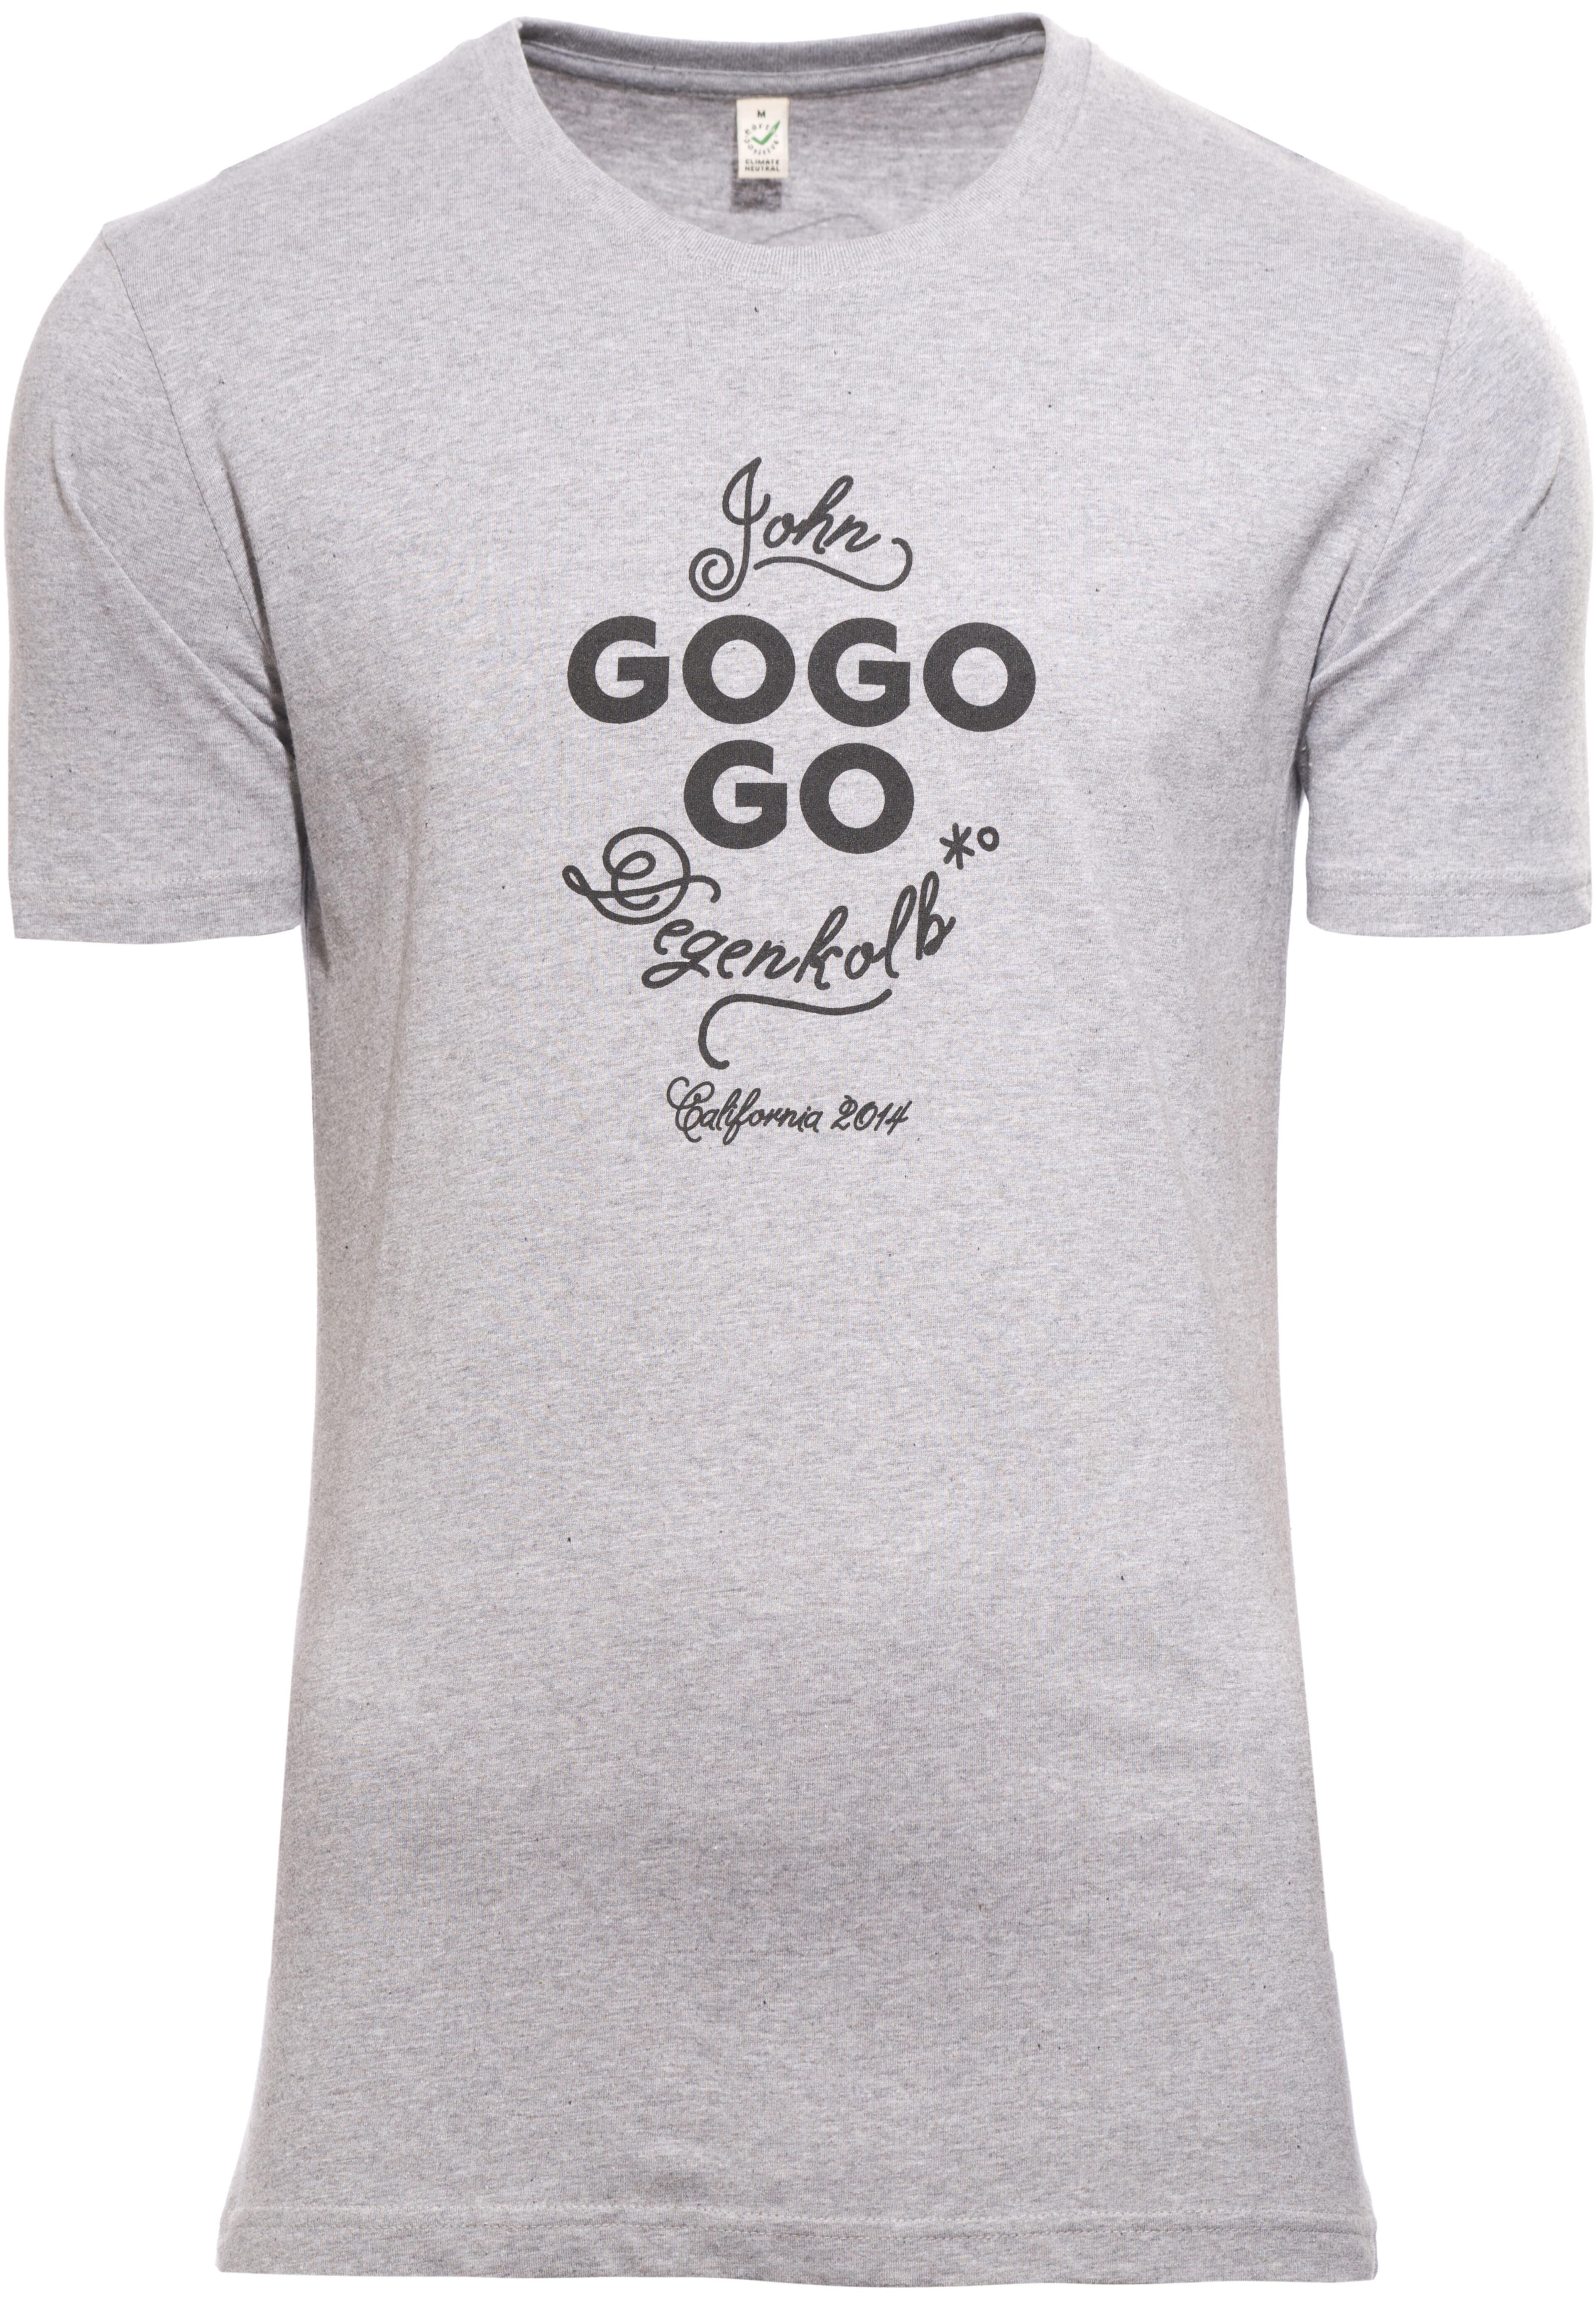 48a239a8 guilty 76 racing gogogo Dege California T-Skjorte Herre Grå | Gode ...